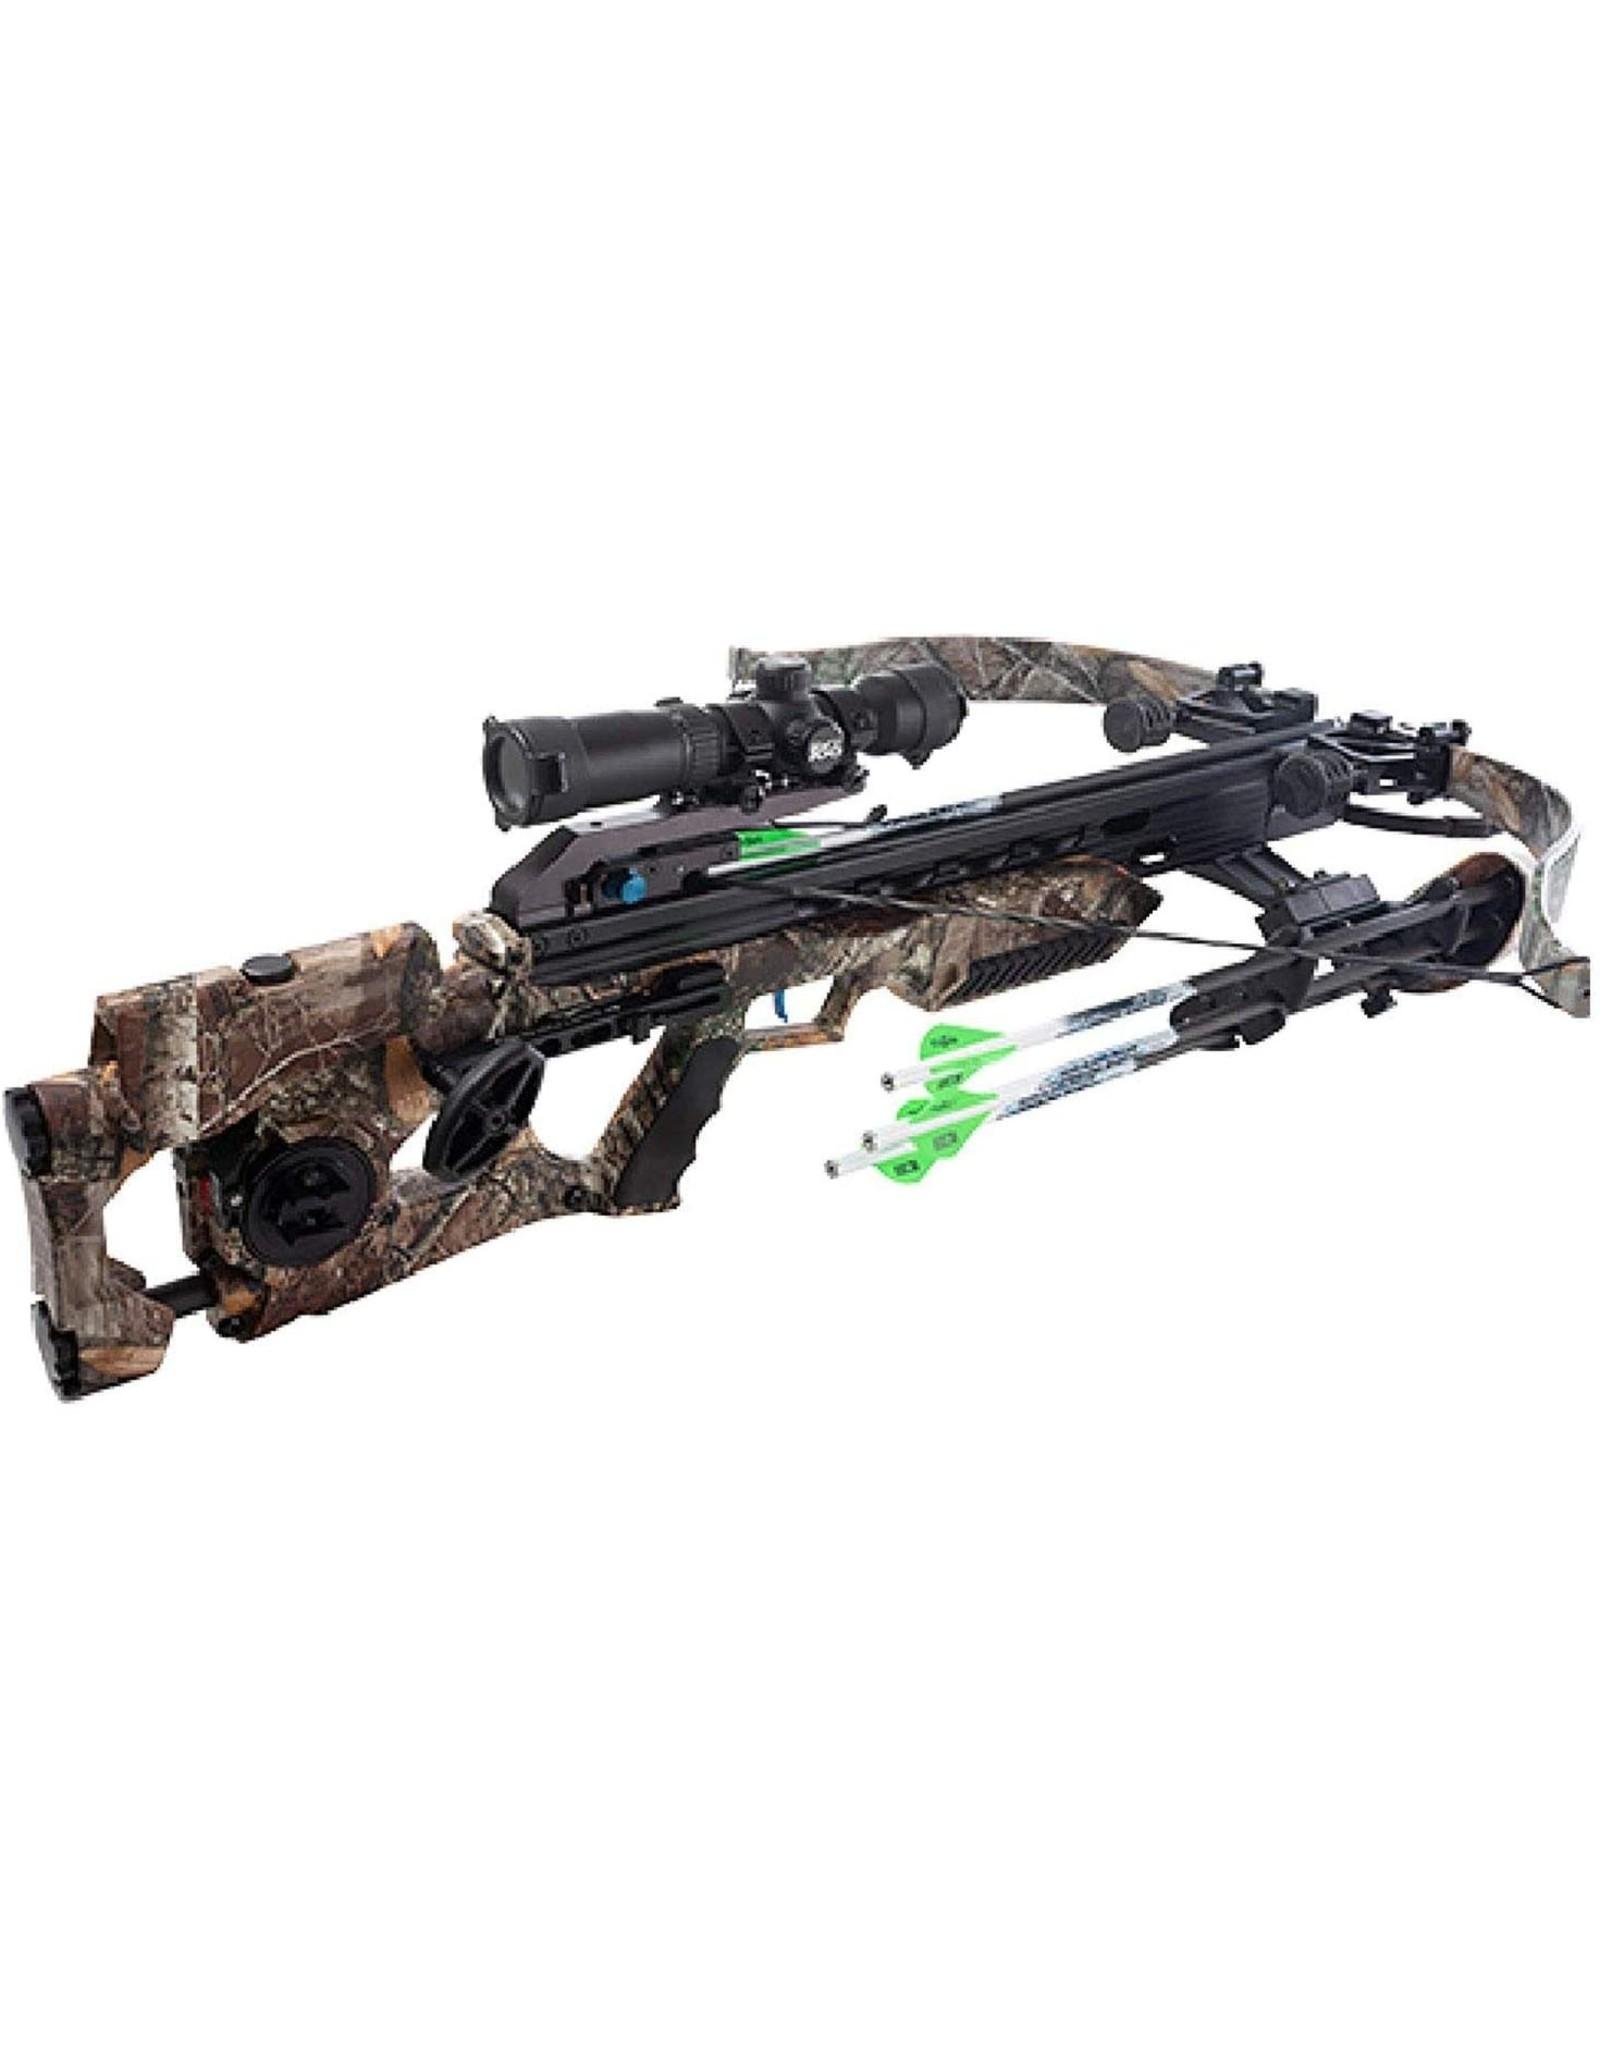 Excalibur Crossbows EXCALIBUR ASSASSIN 420TD #E73608